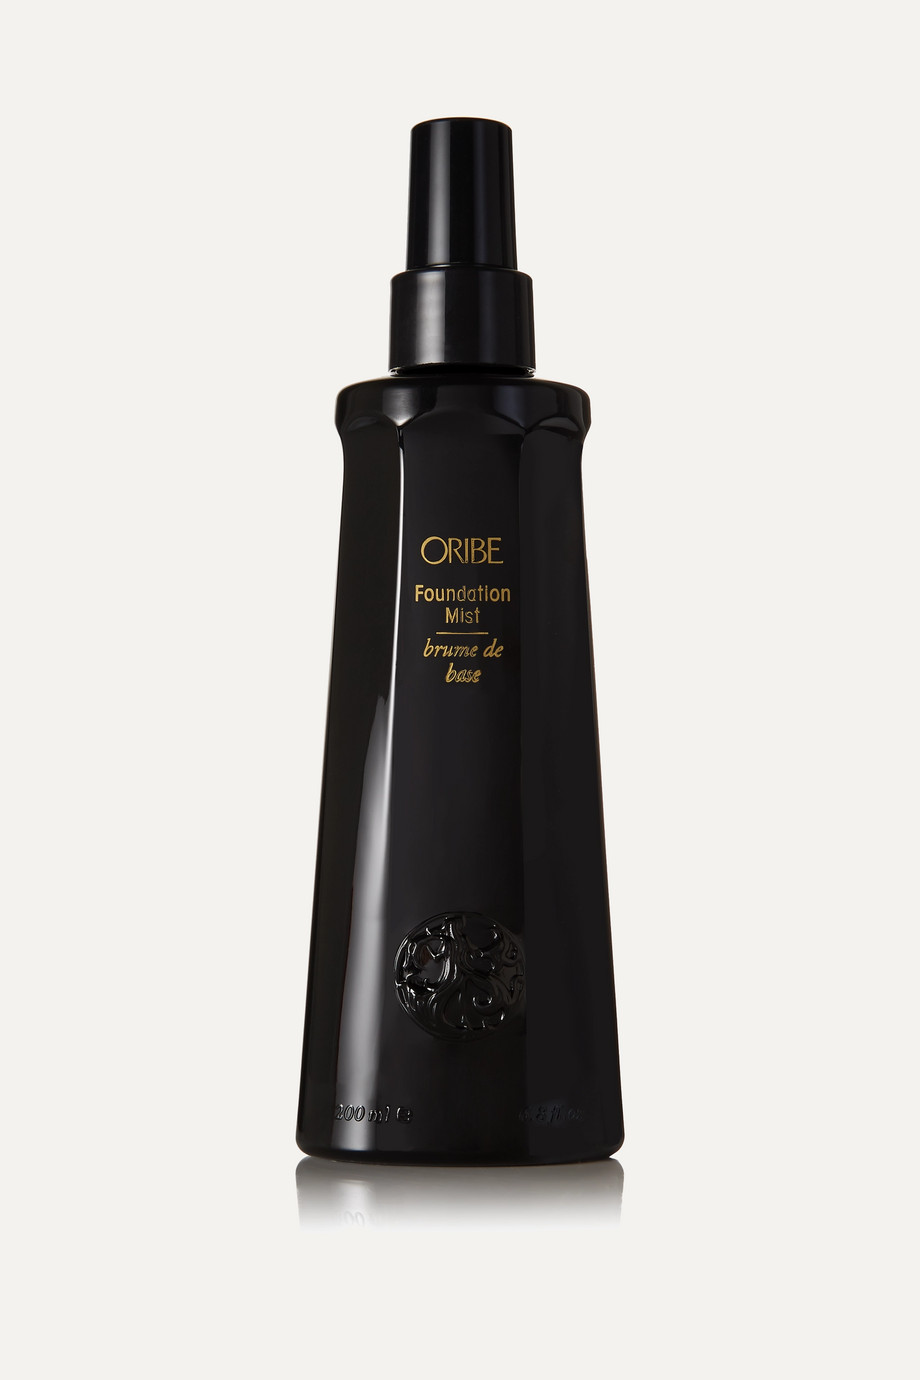 Oribe Foundation Mist, 200ml